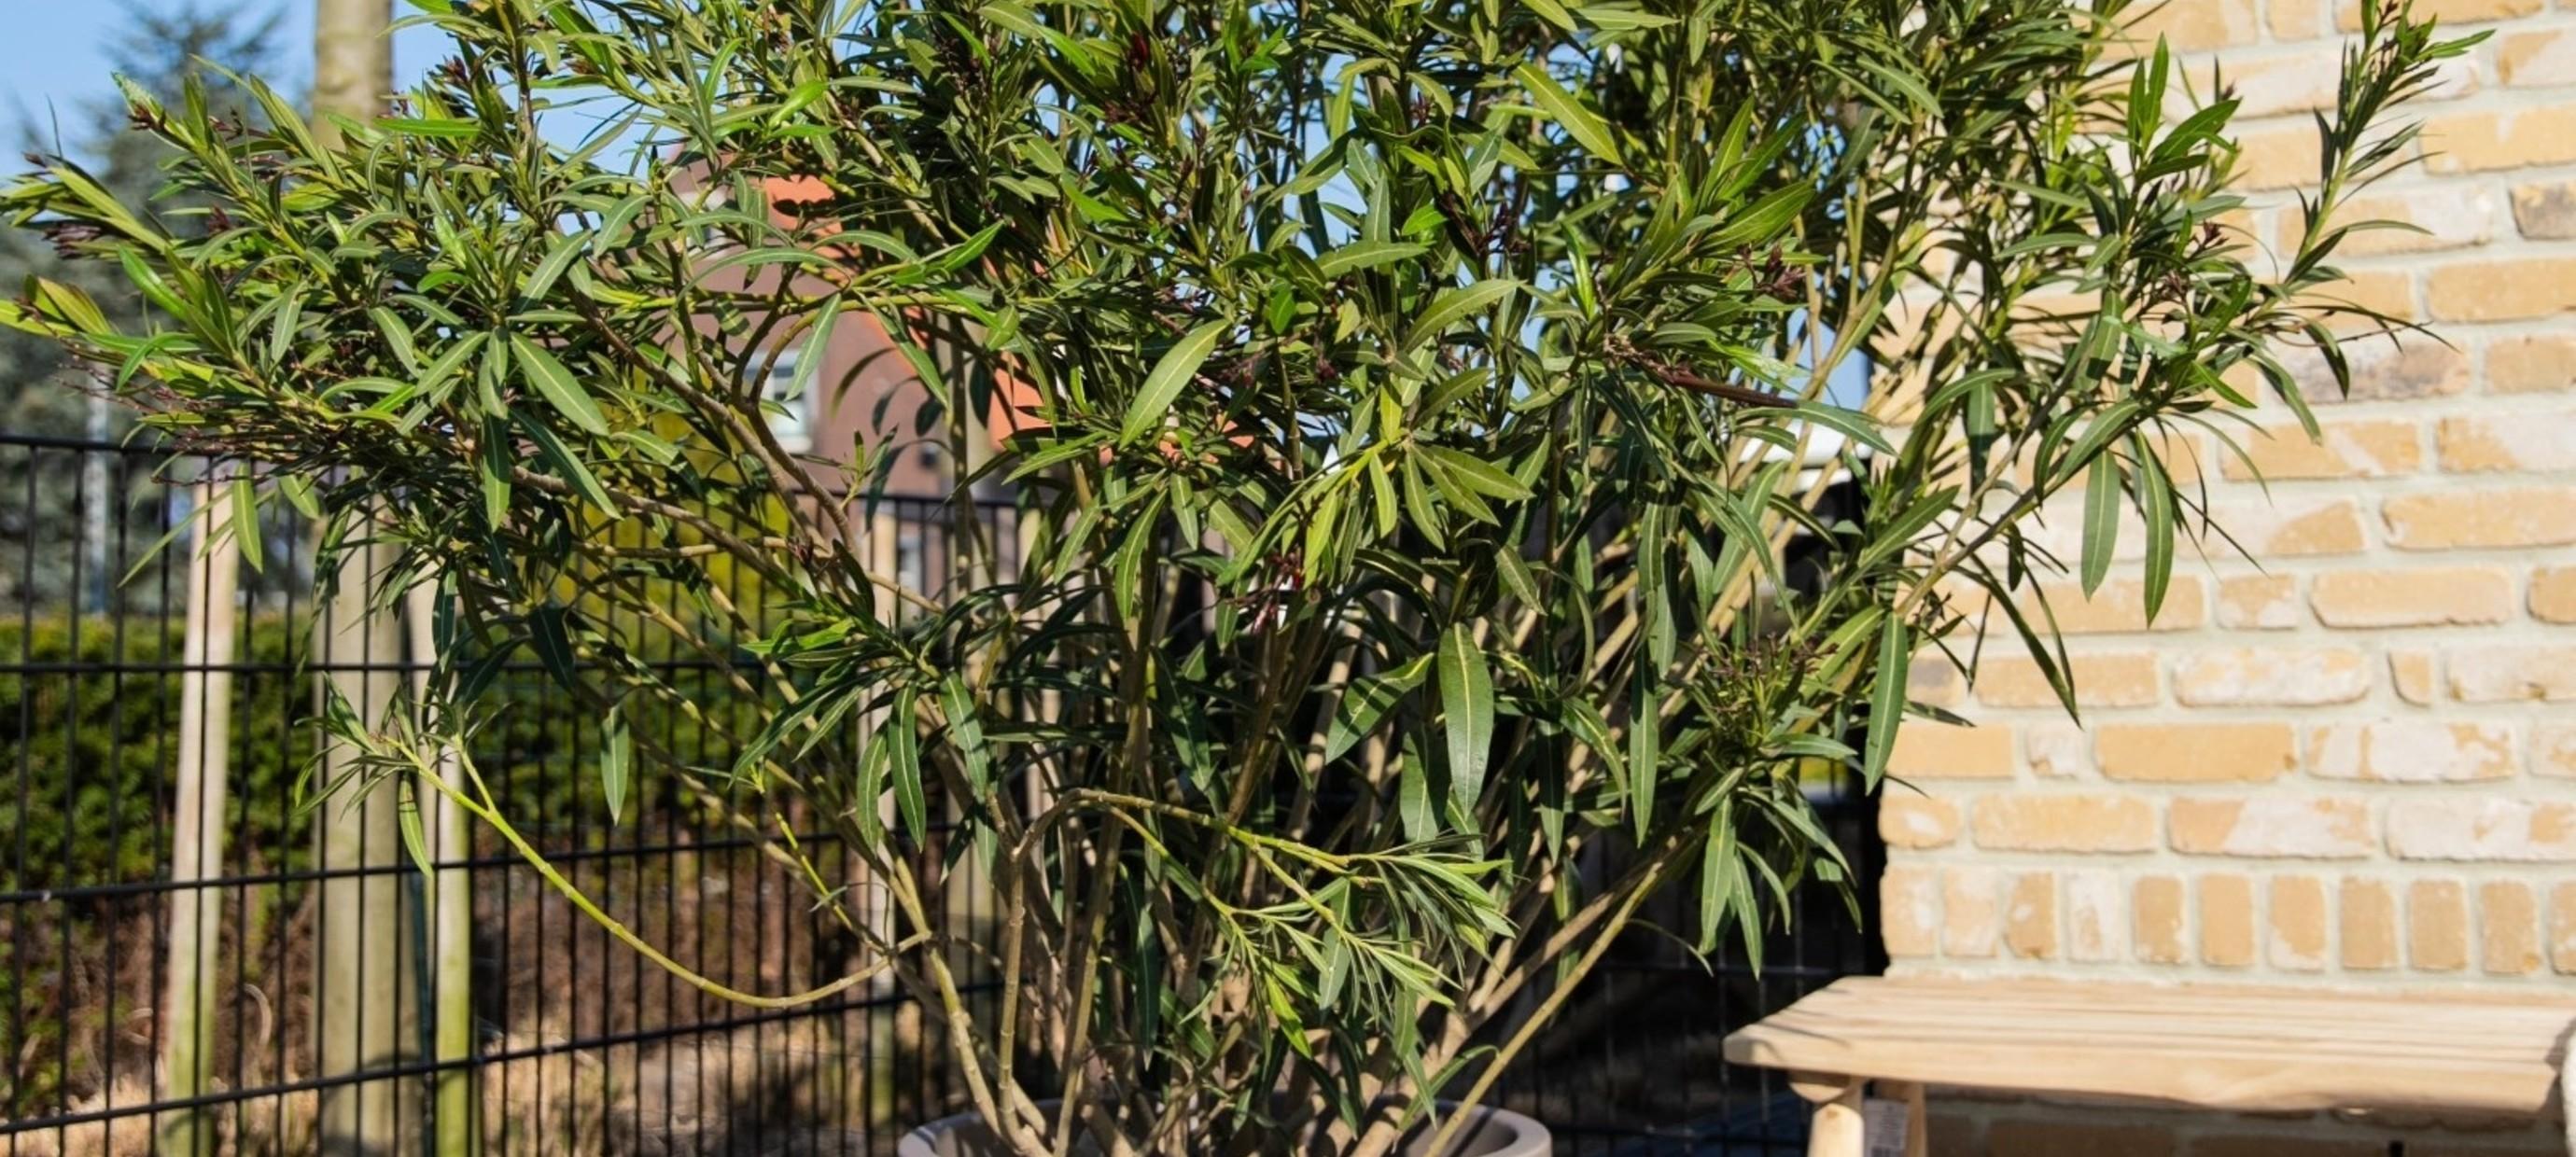 Hoe stek ik mijn Oleander?